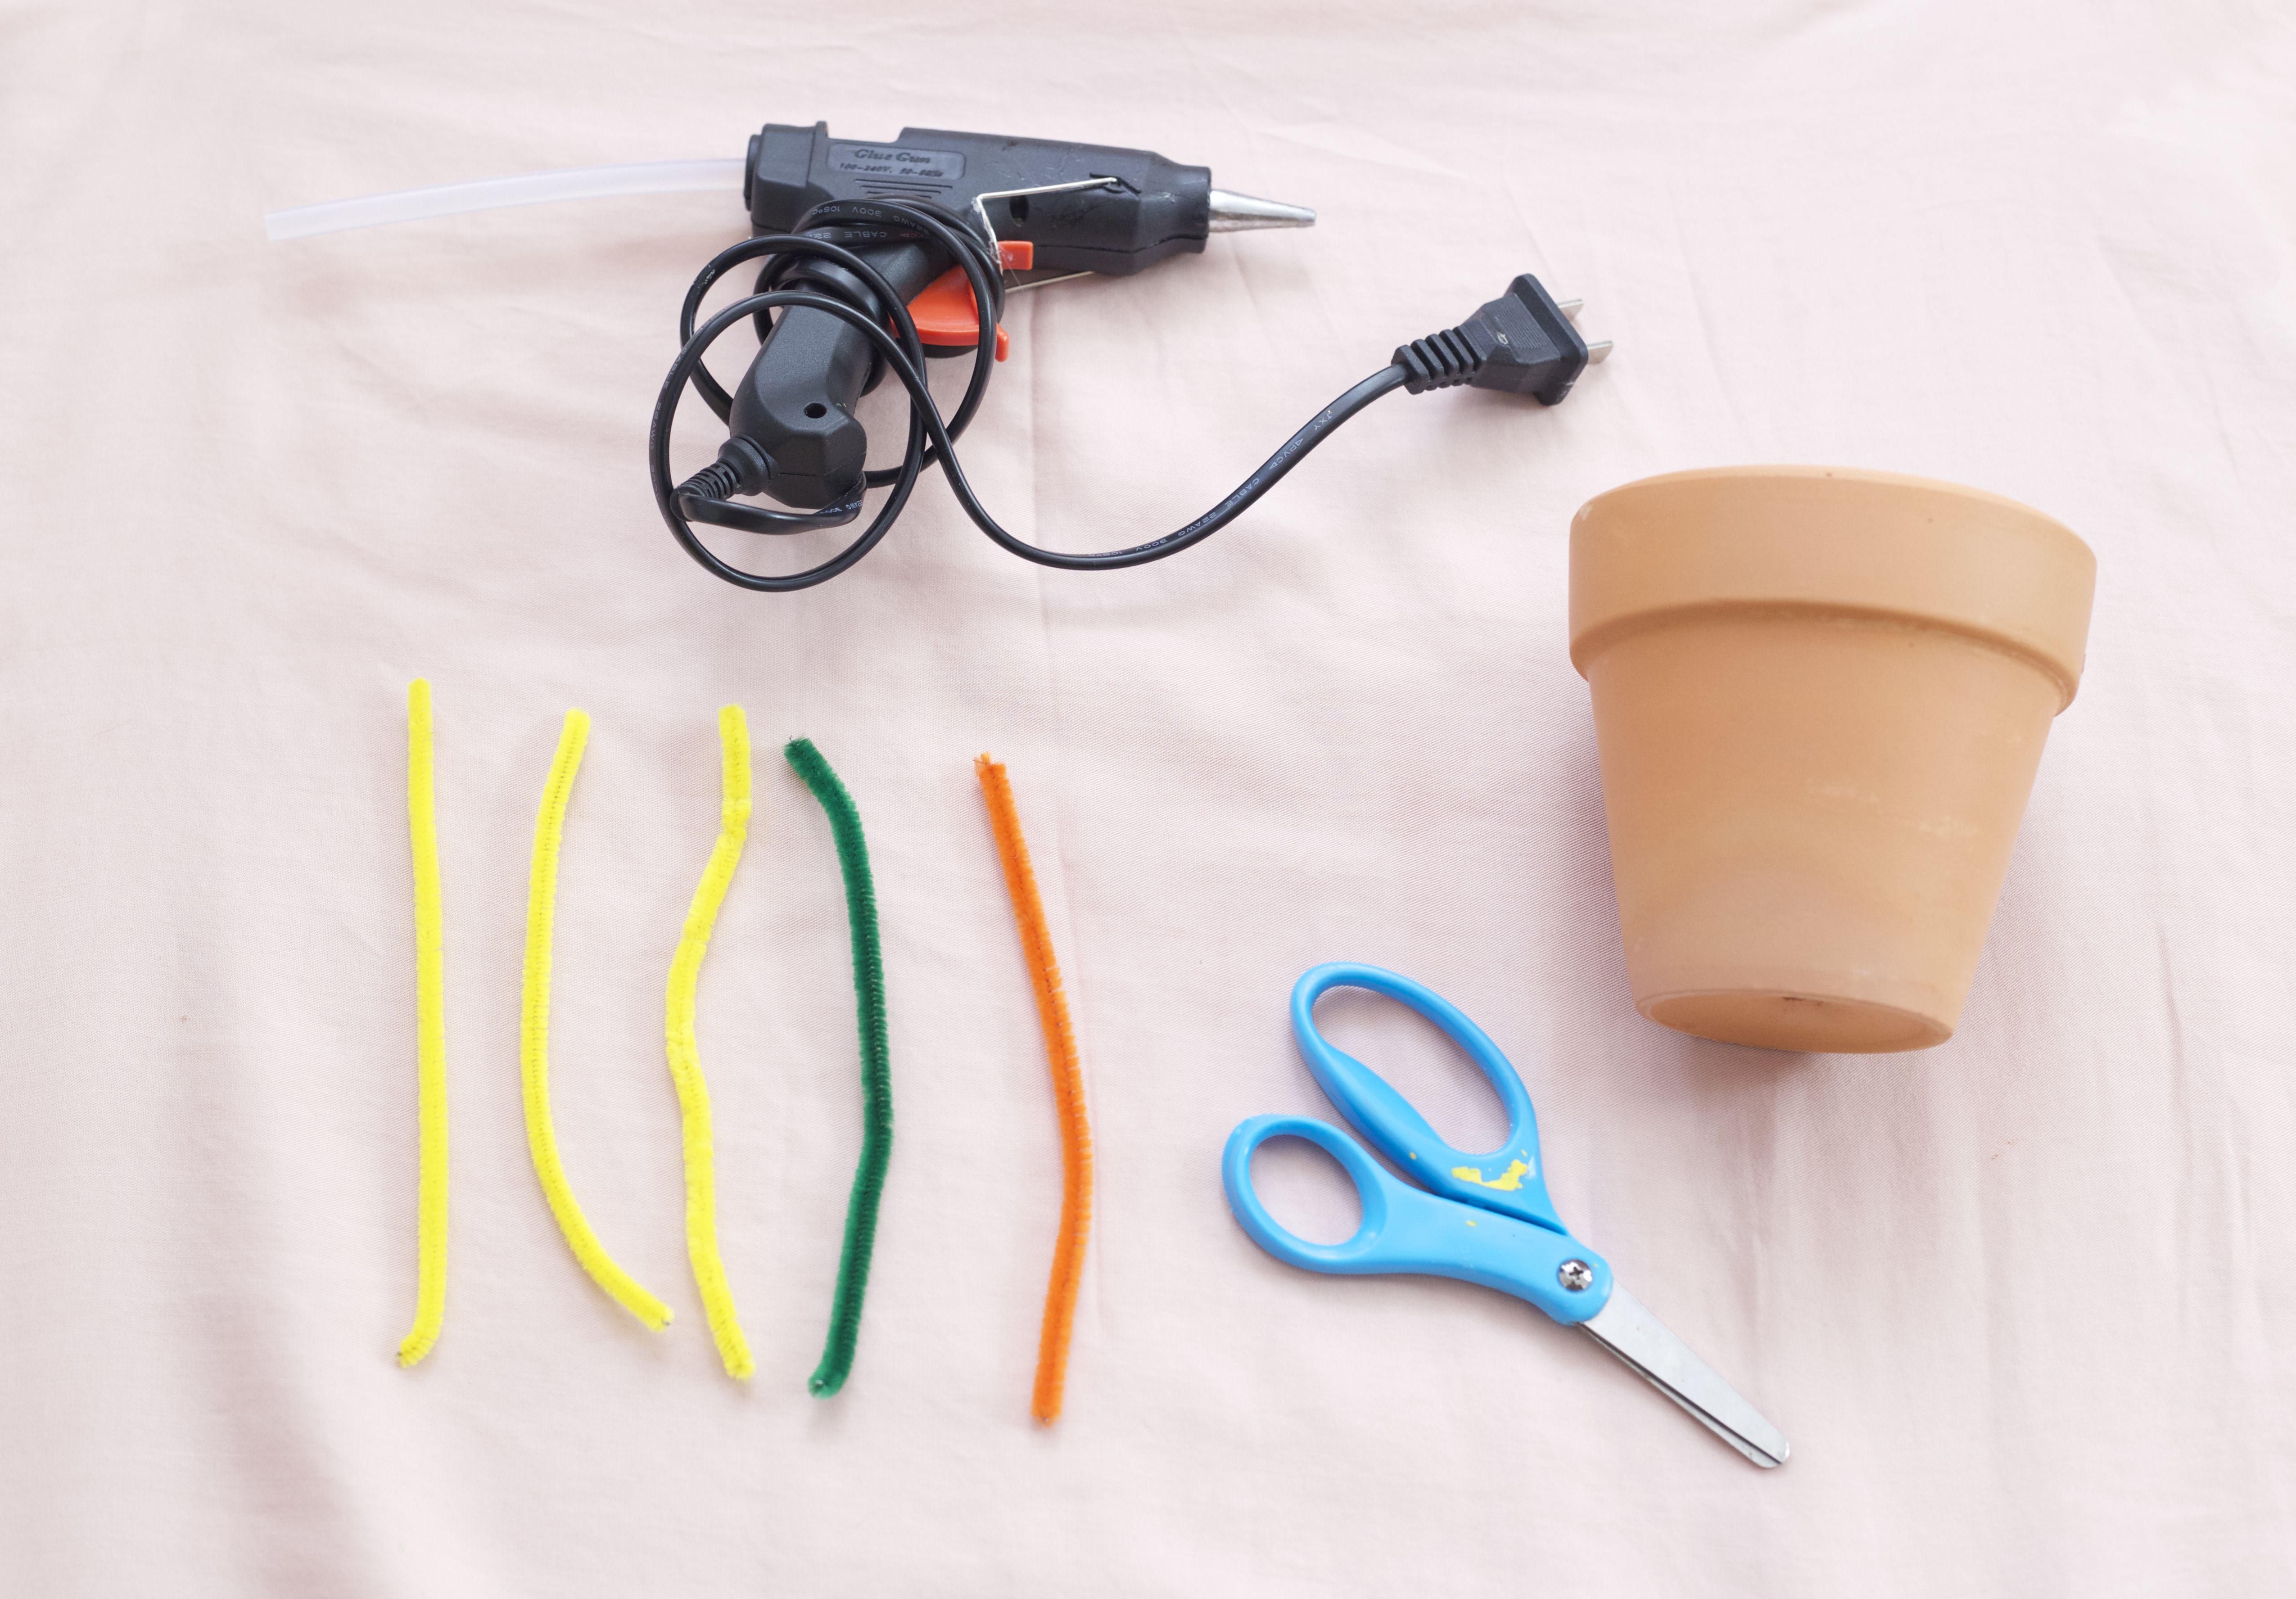 Hot glue gun, pipe cleaners, flower pot, and scissors